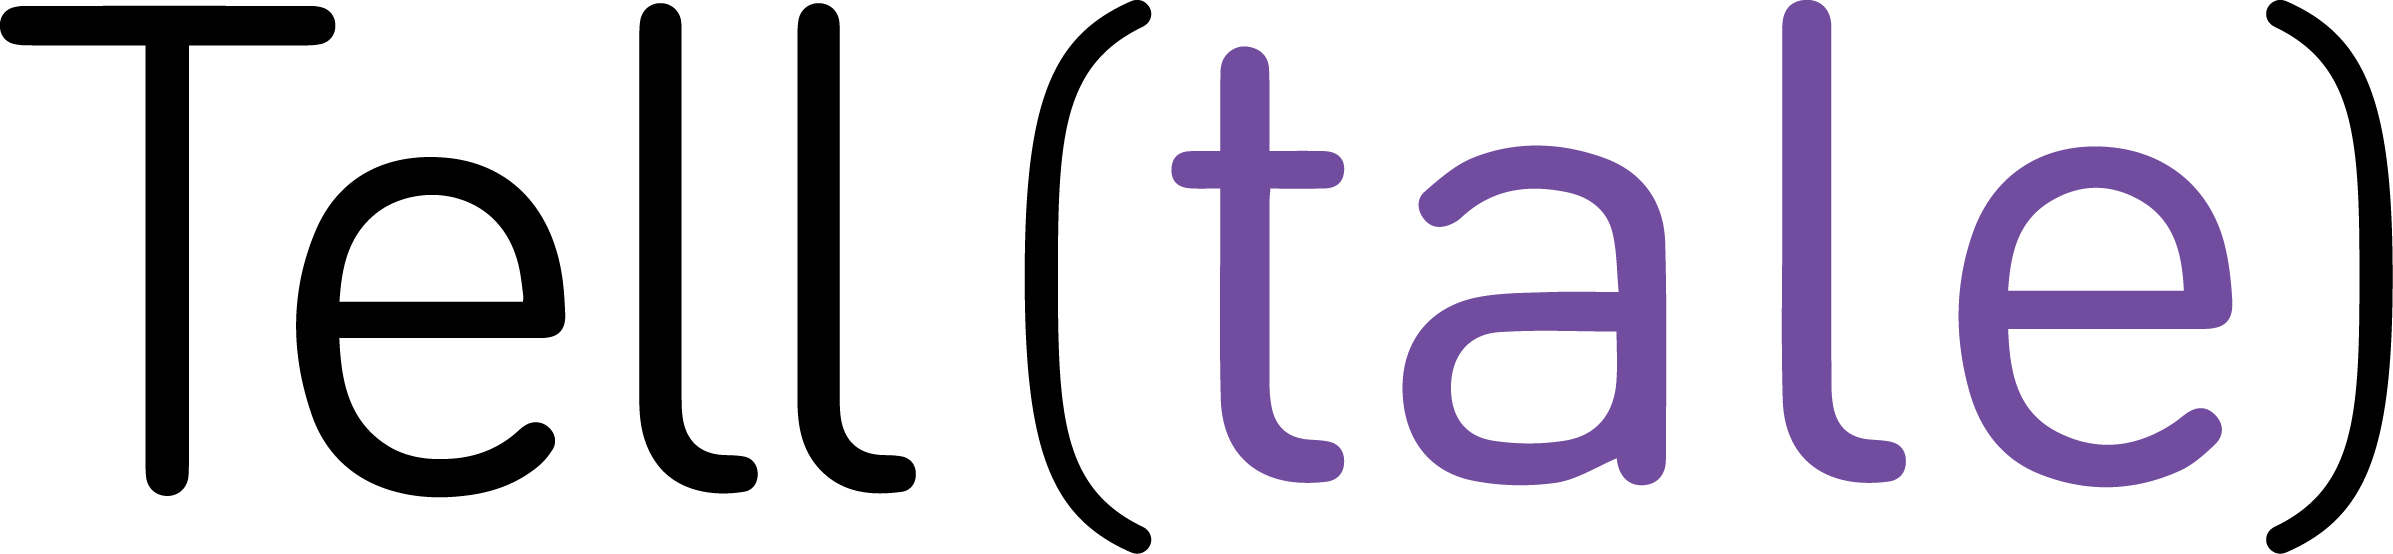 testimonial-avatar-11